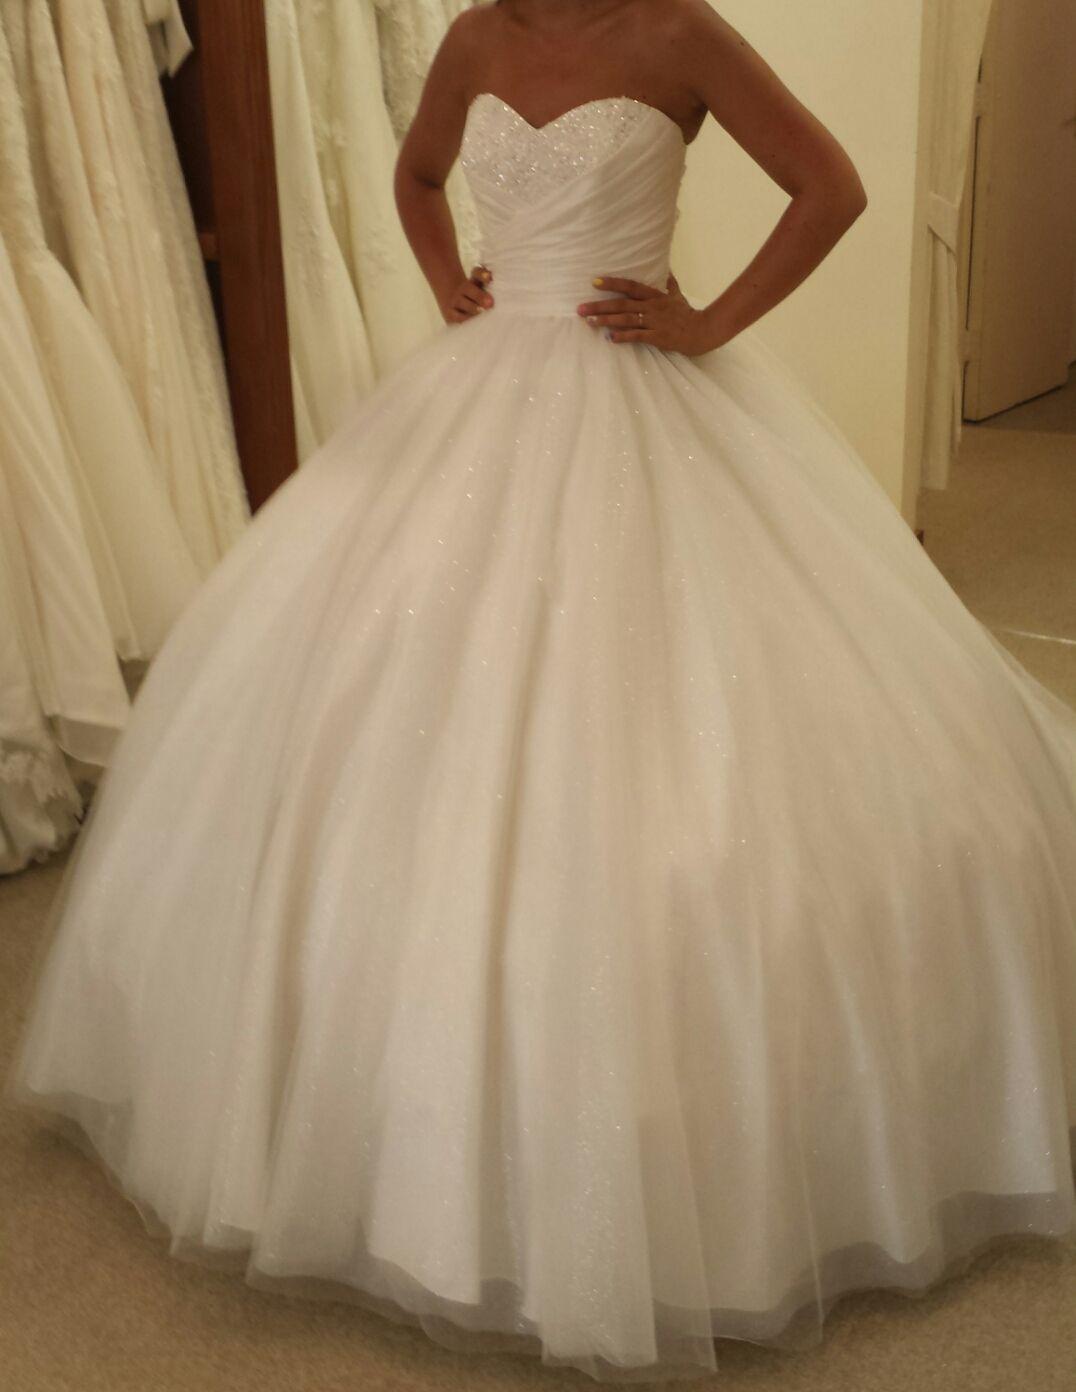 Poofy wedding dresses my big poofy alfred angelo cinderella 205 poofy wedding dresses my big poofy alfred angelo cinderella 205 wedding dress ombrellifo Choice Image